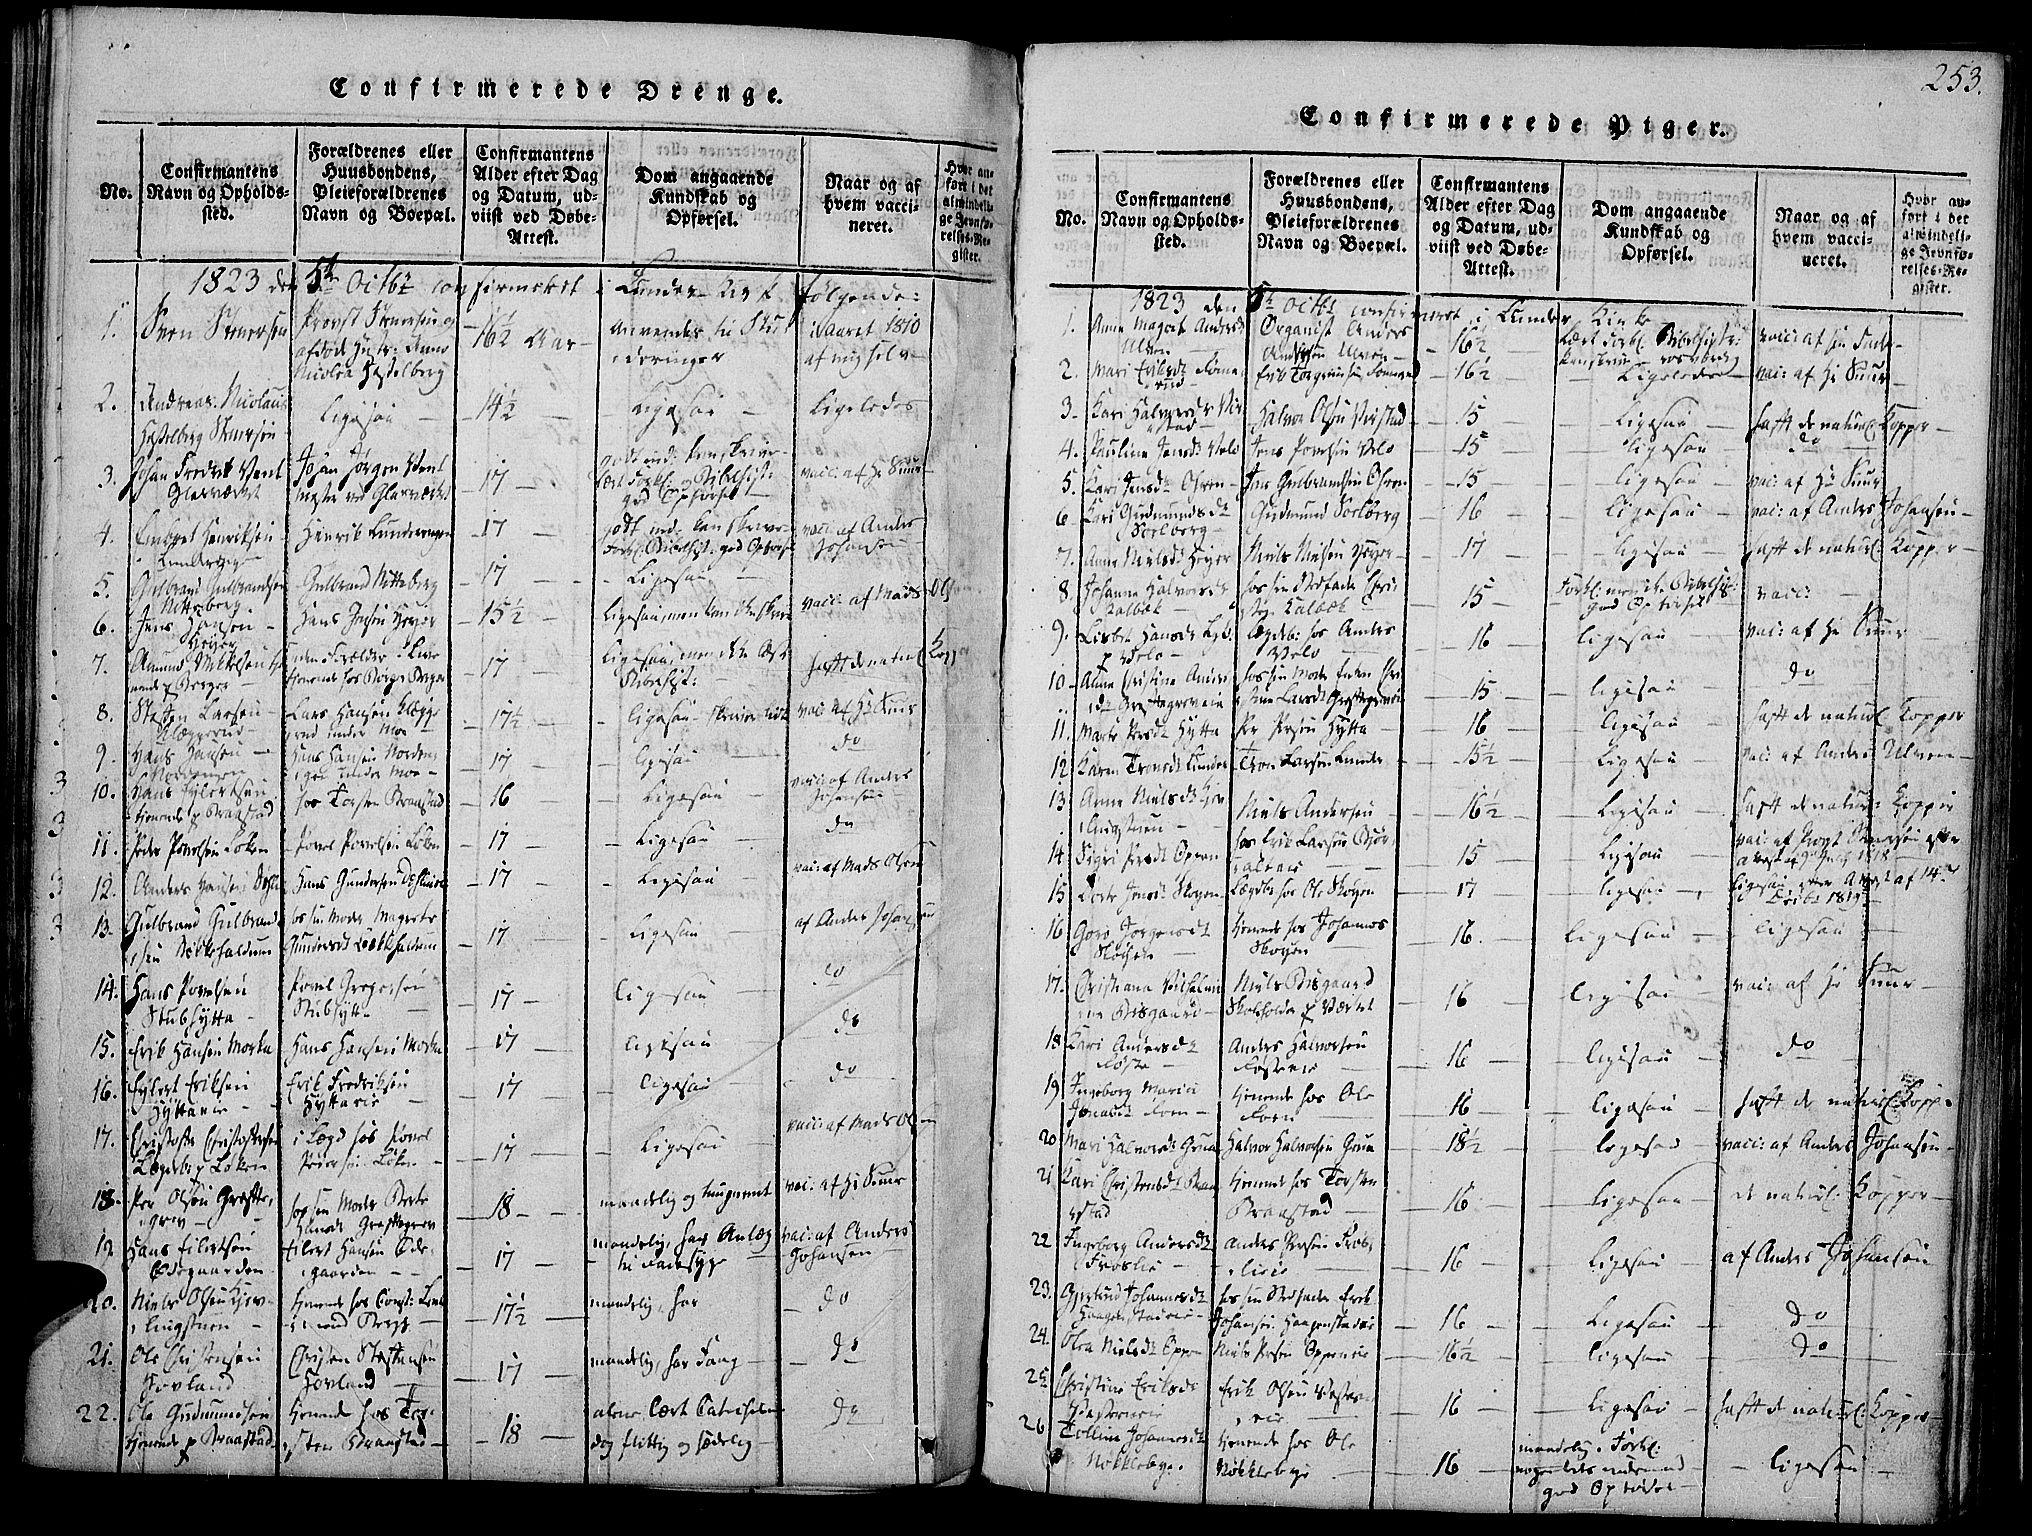 SAH, Jevnaker prestekontor, Ministerialbok nr. 5, 1815-1837, s. 253